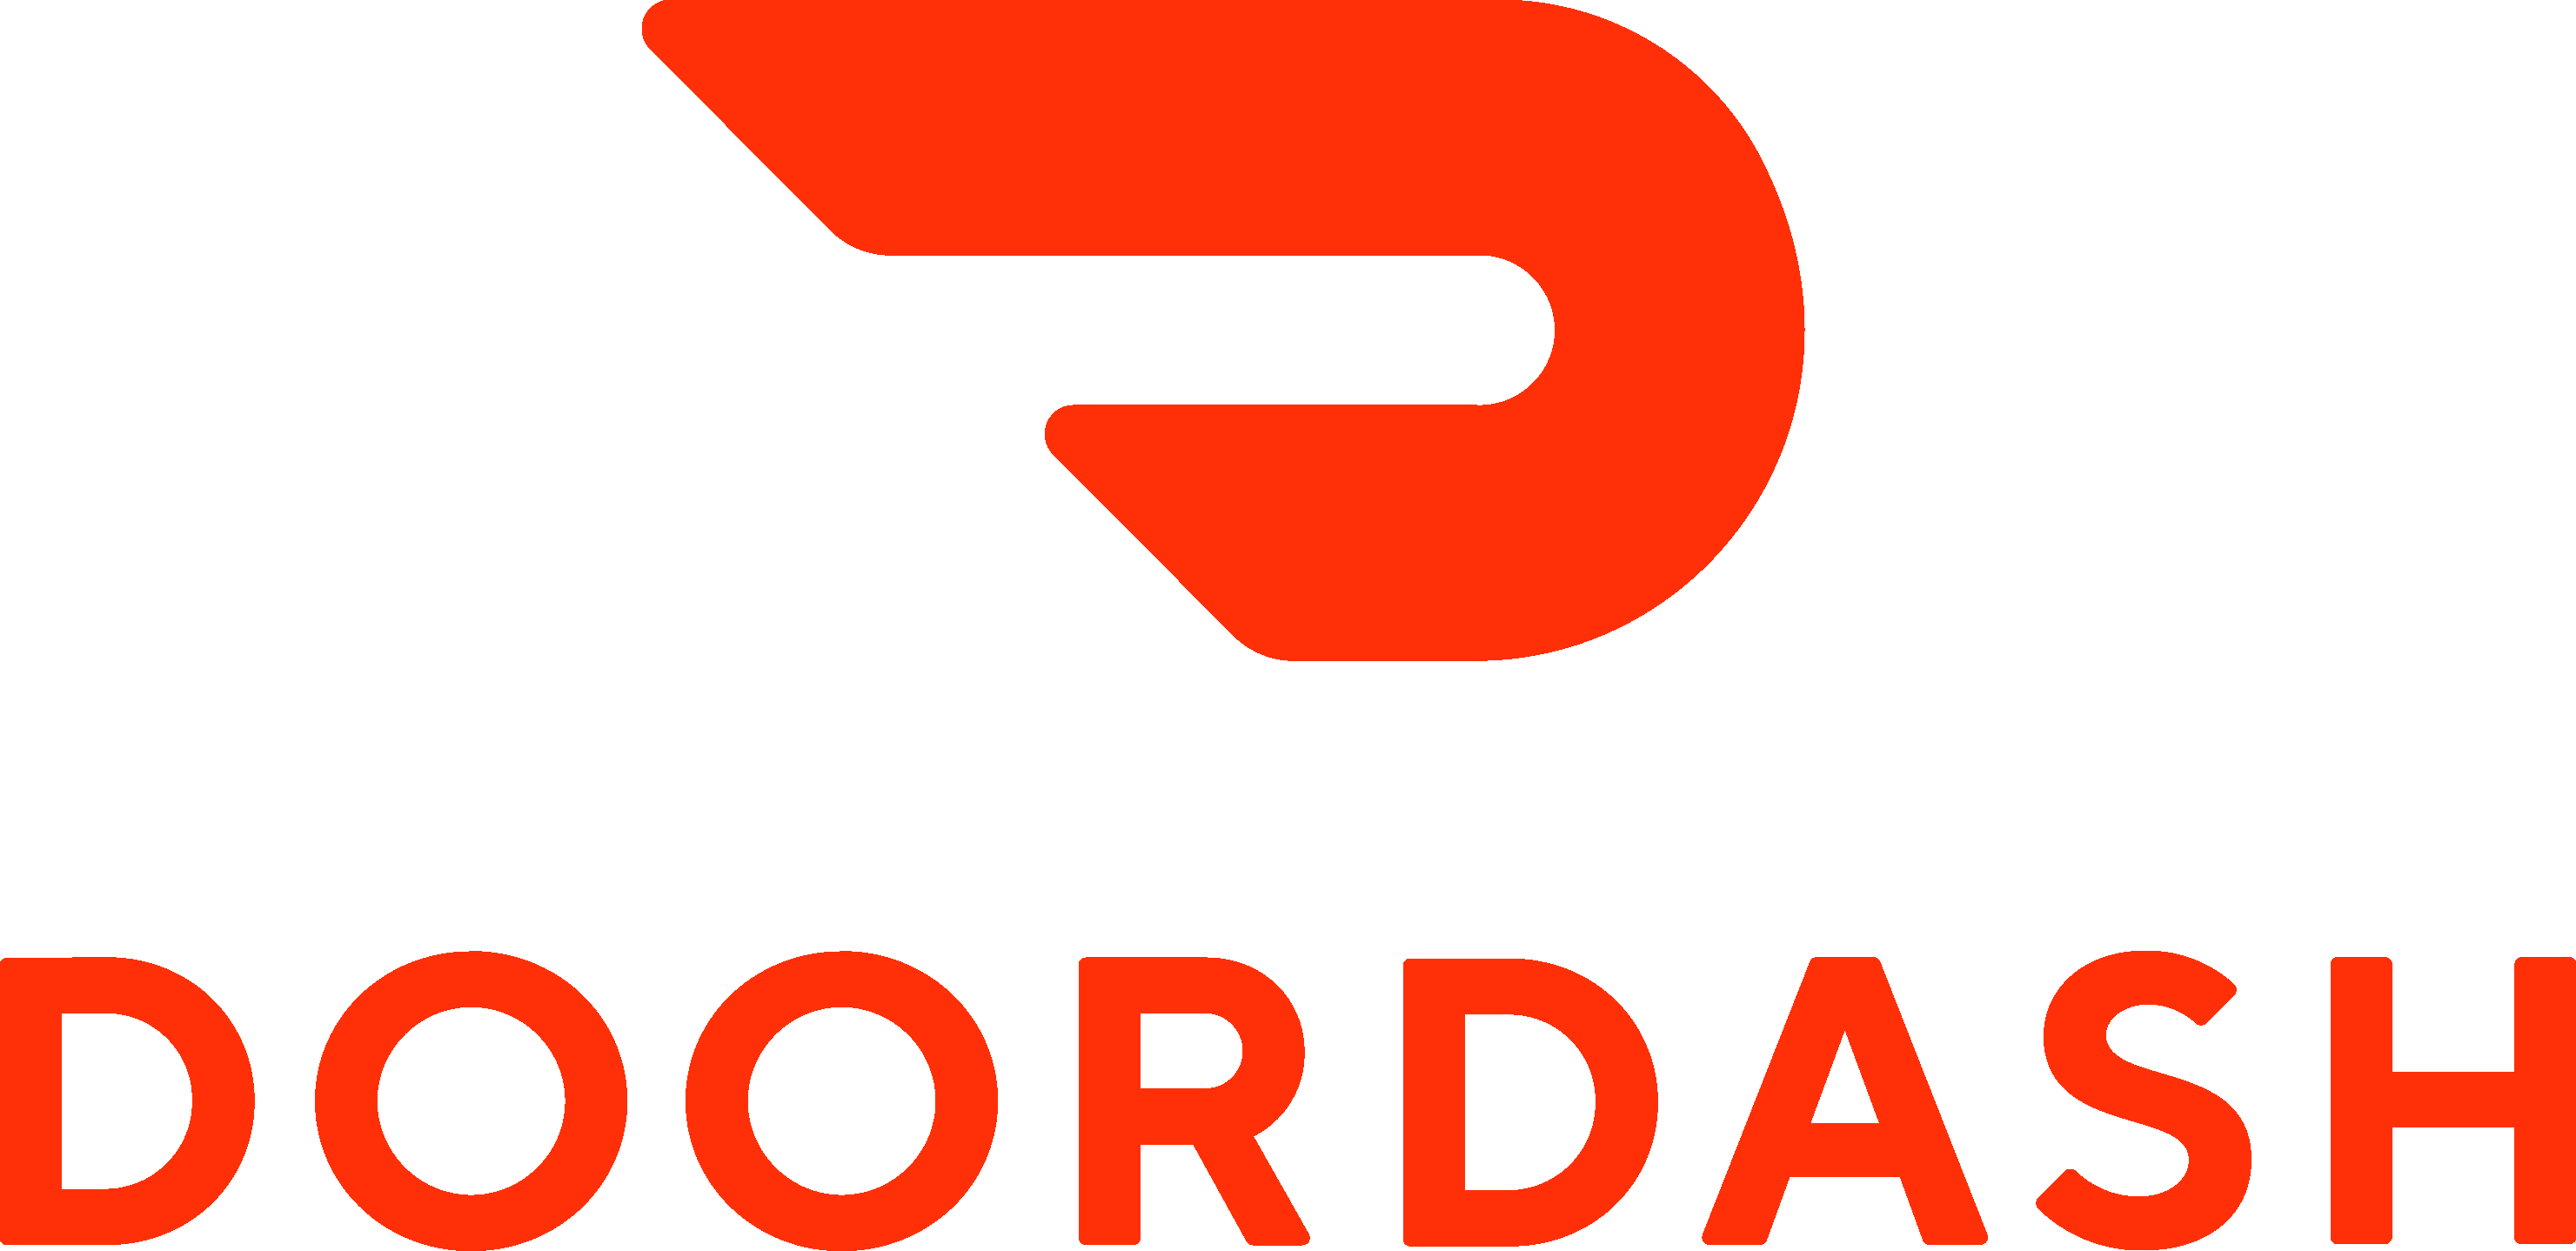 doordash logo vector eps free download  logo  icons  clipart logo vectors scratch logo vectors about spices